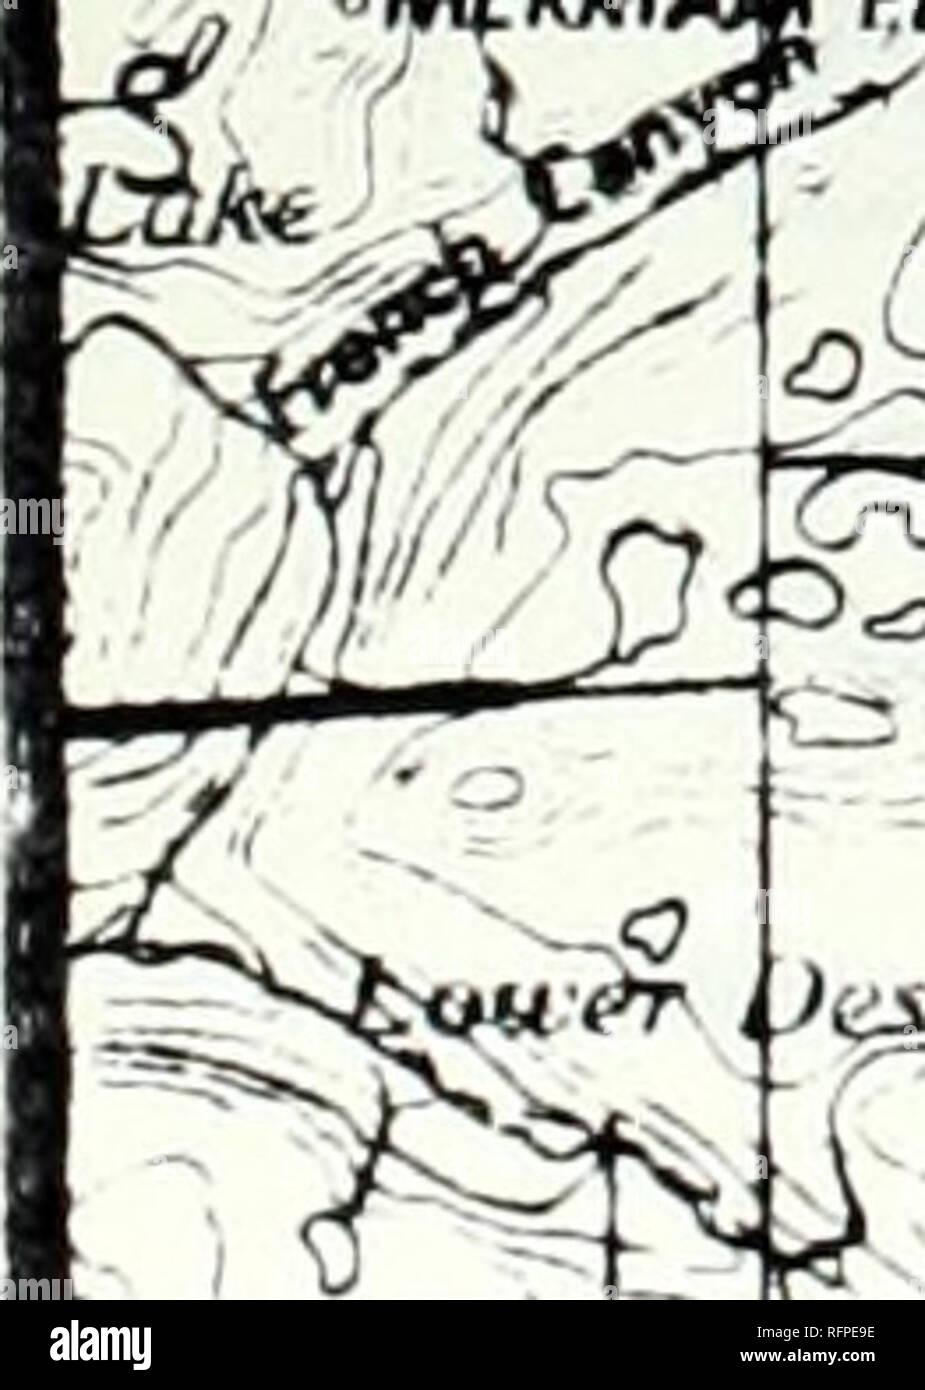 Casa Diablo G-E-M resources area (GRA no  CA-06) : technical report